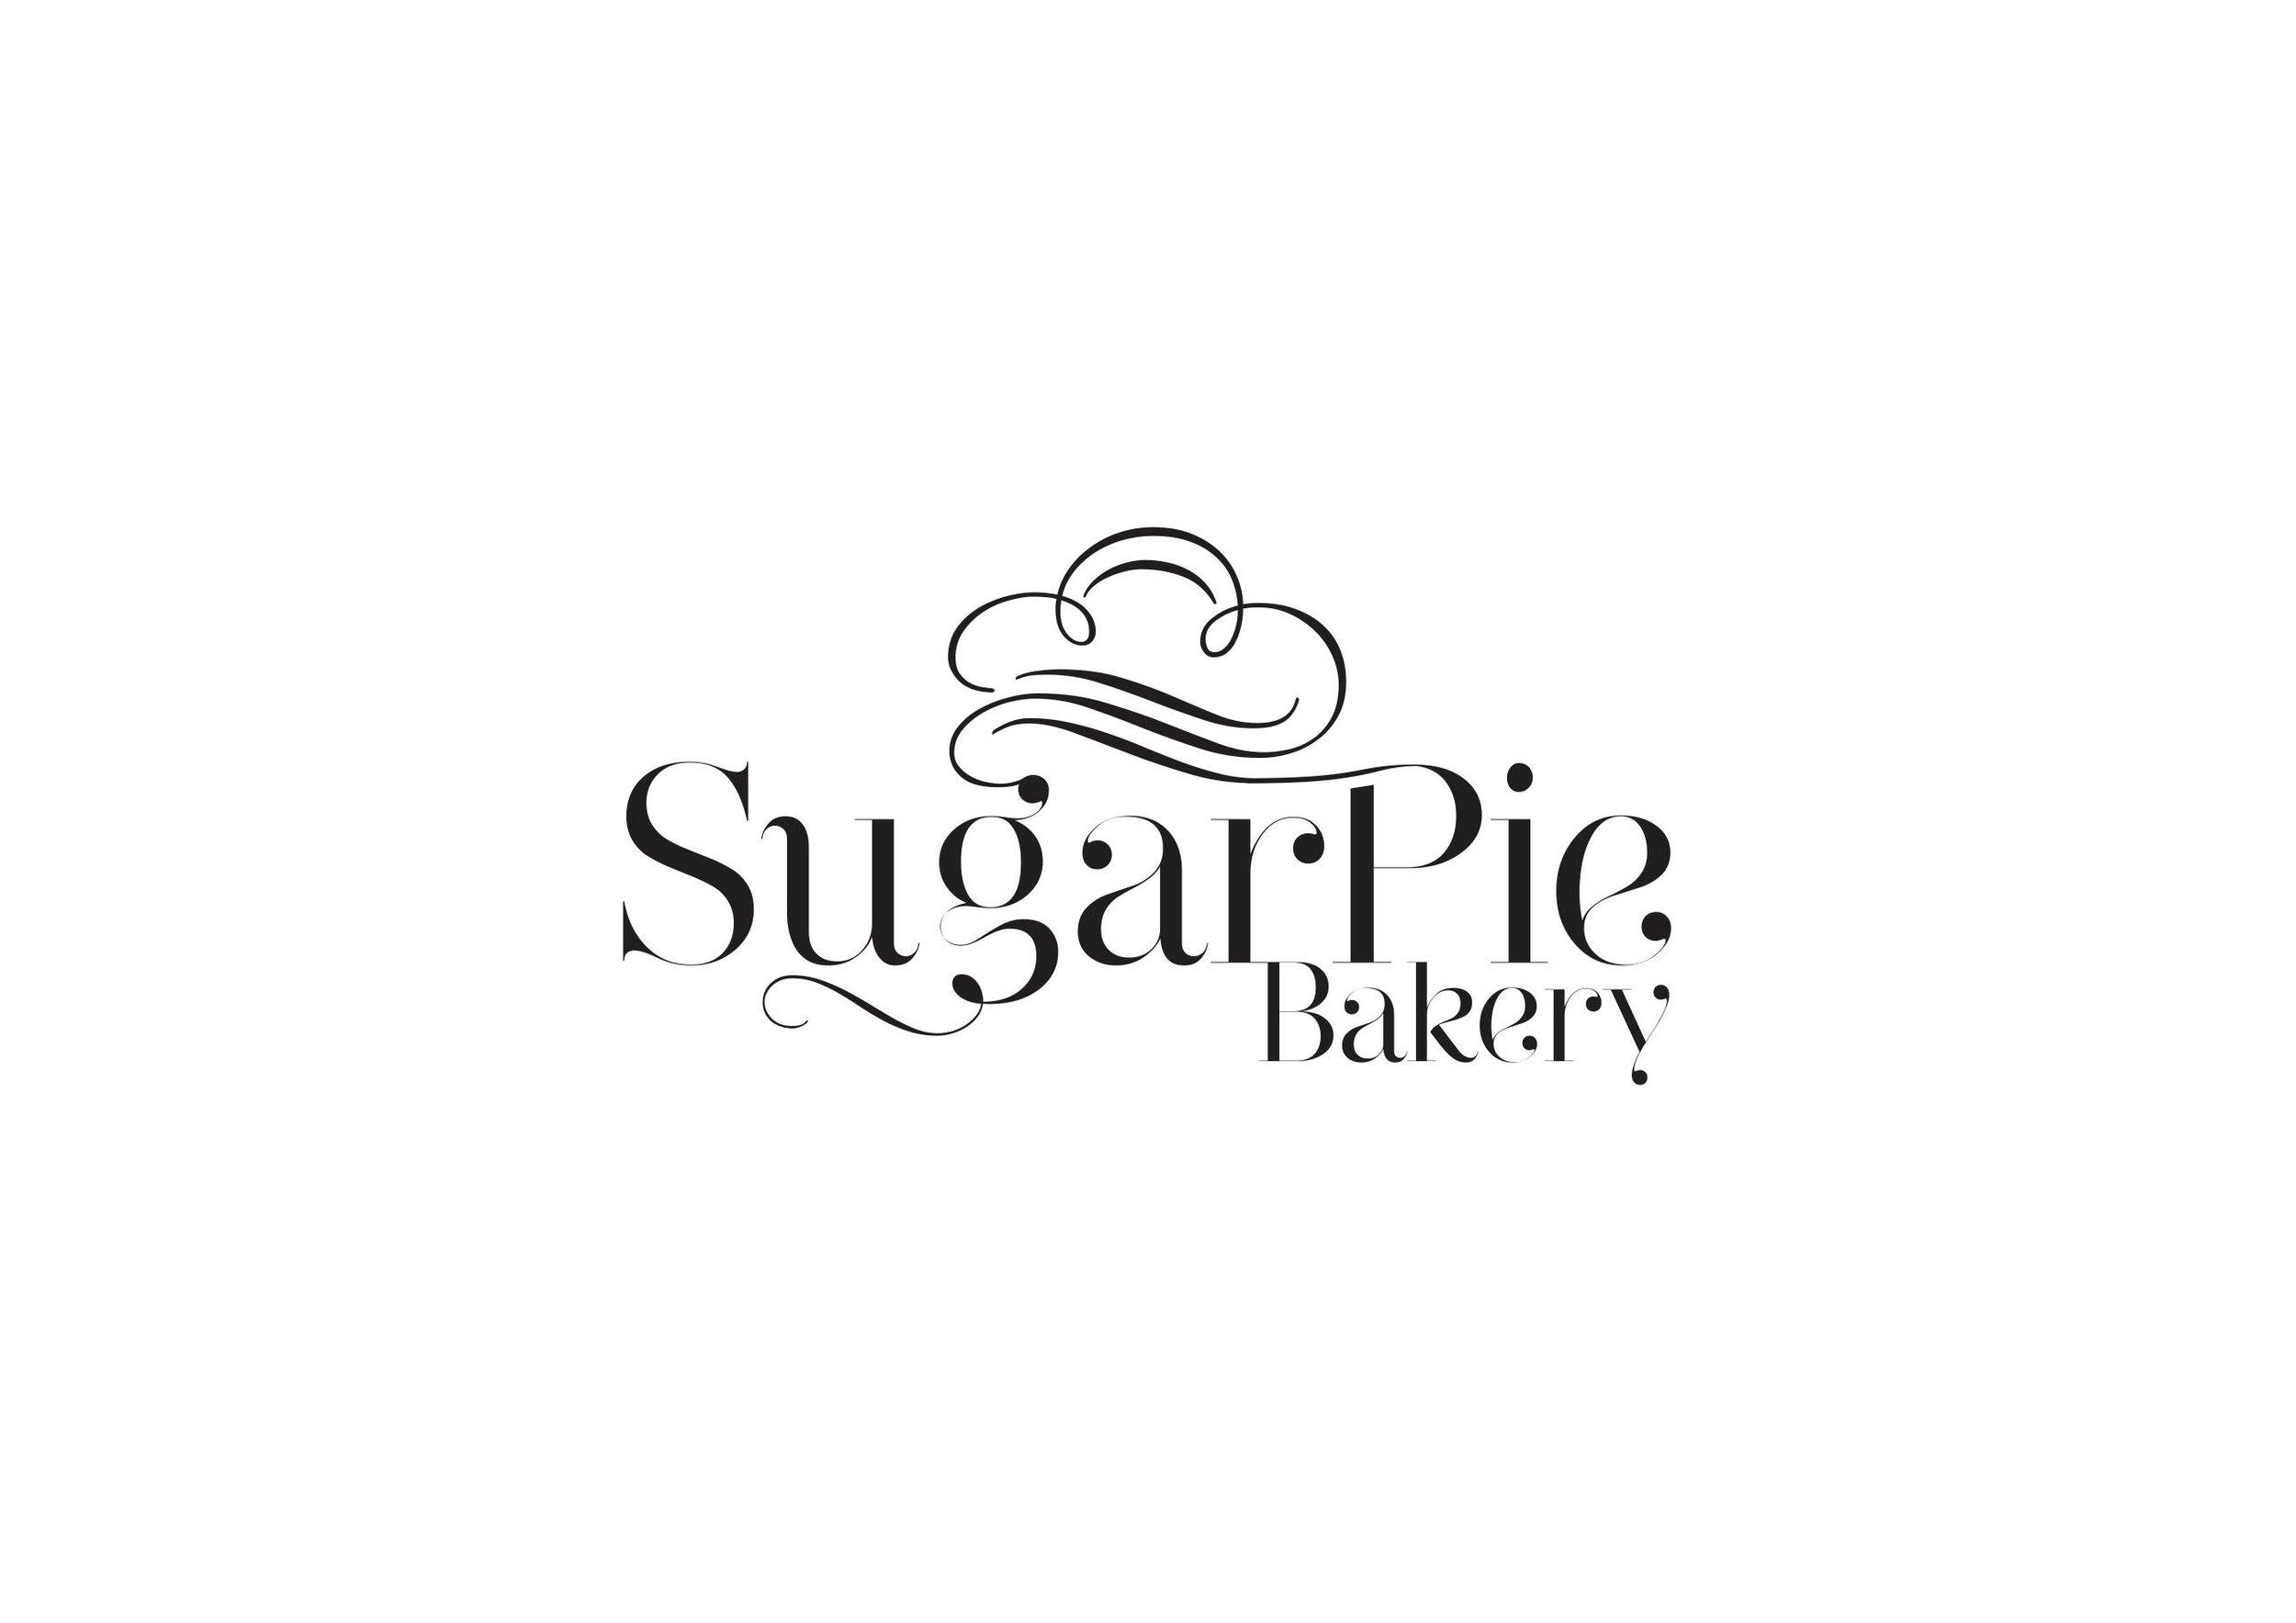 logo-SPB-jpg.jpg